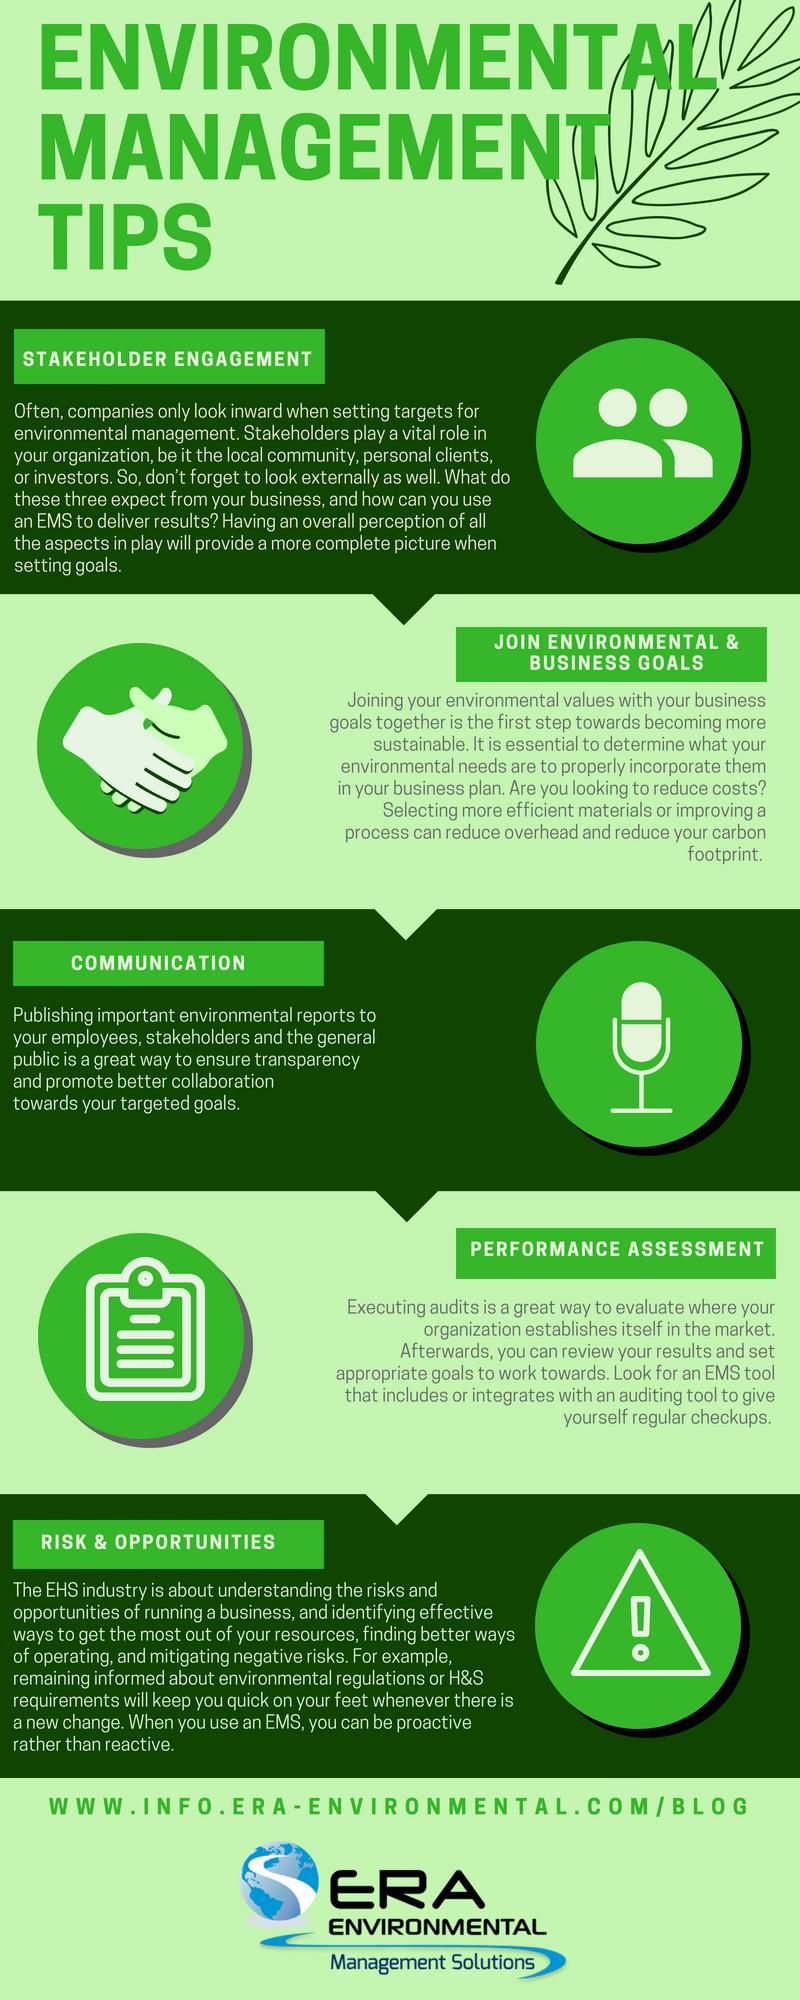 Environmental Management Tips V2